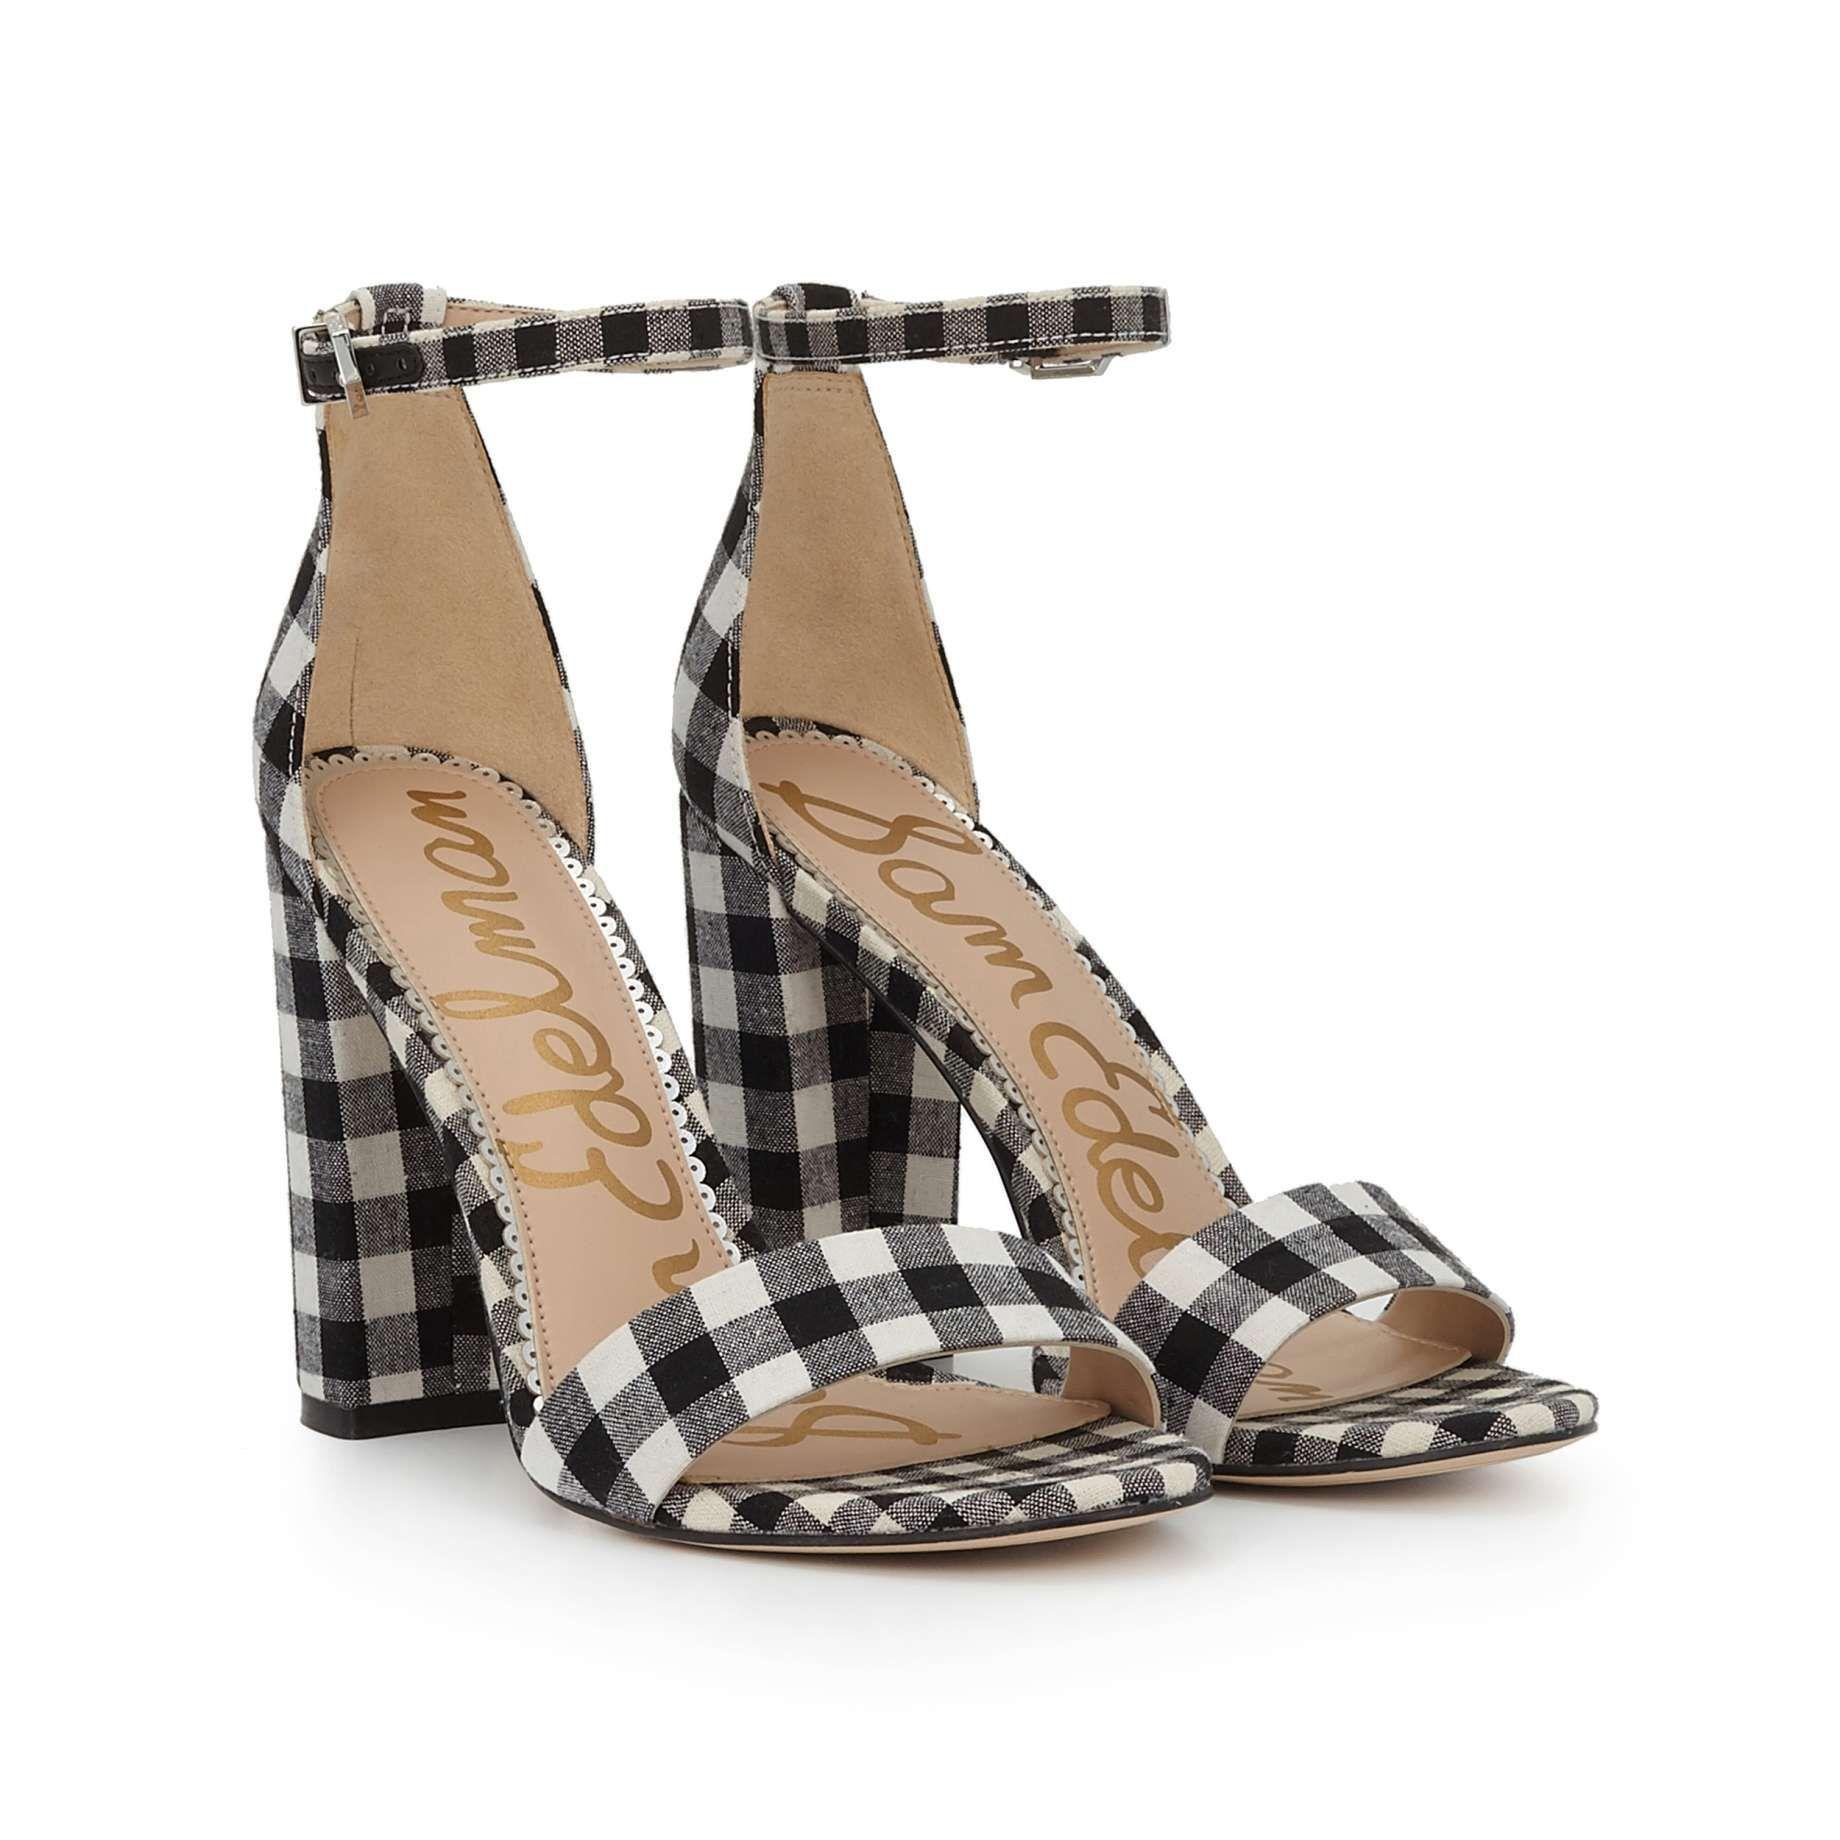 26dbe405f2f Yaro Block Heel Sandal by Sam Edelman - Black White Gingham - View 1 ...